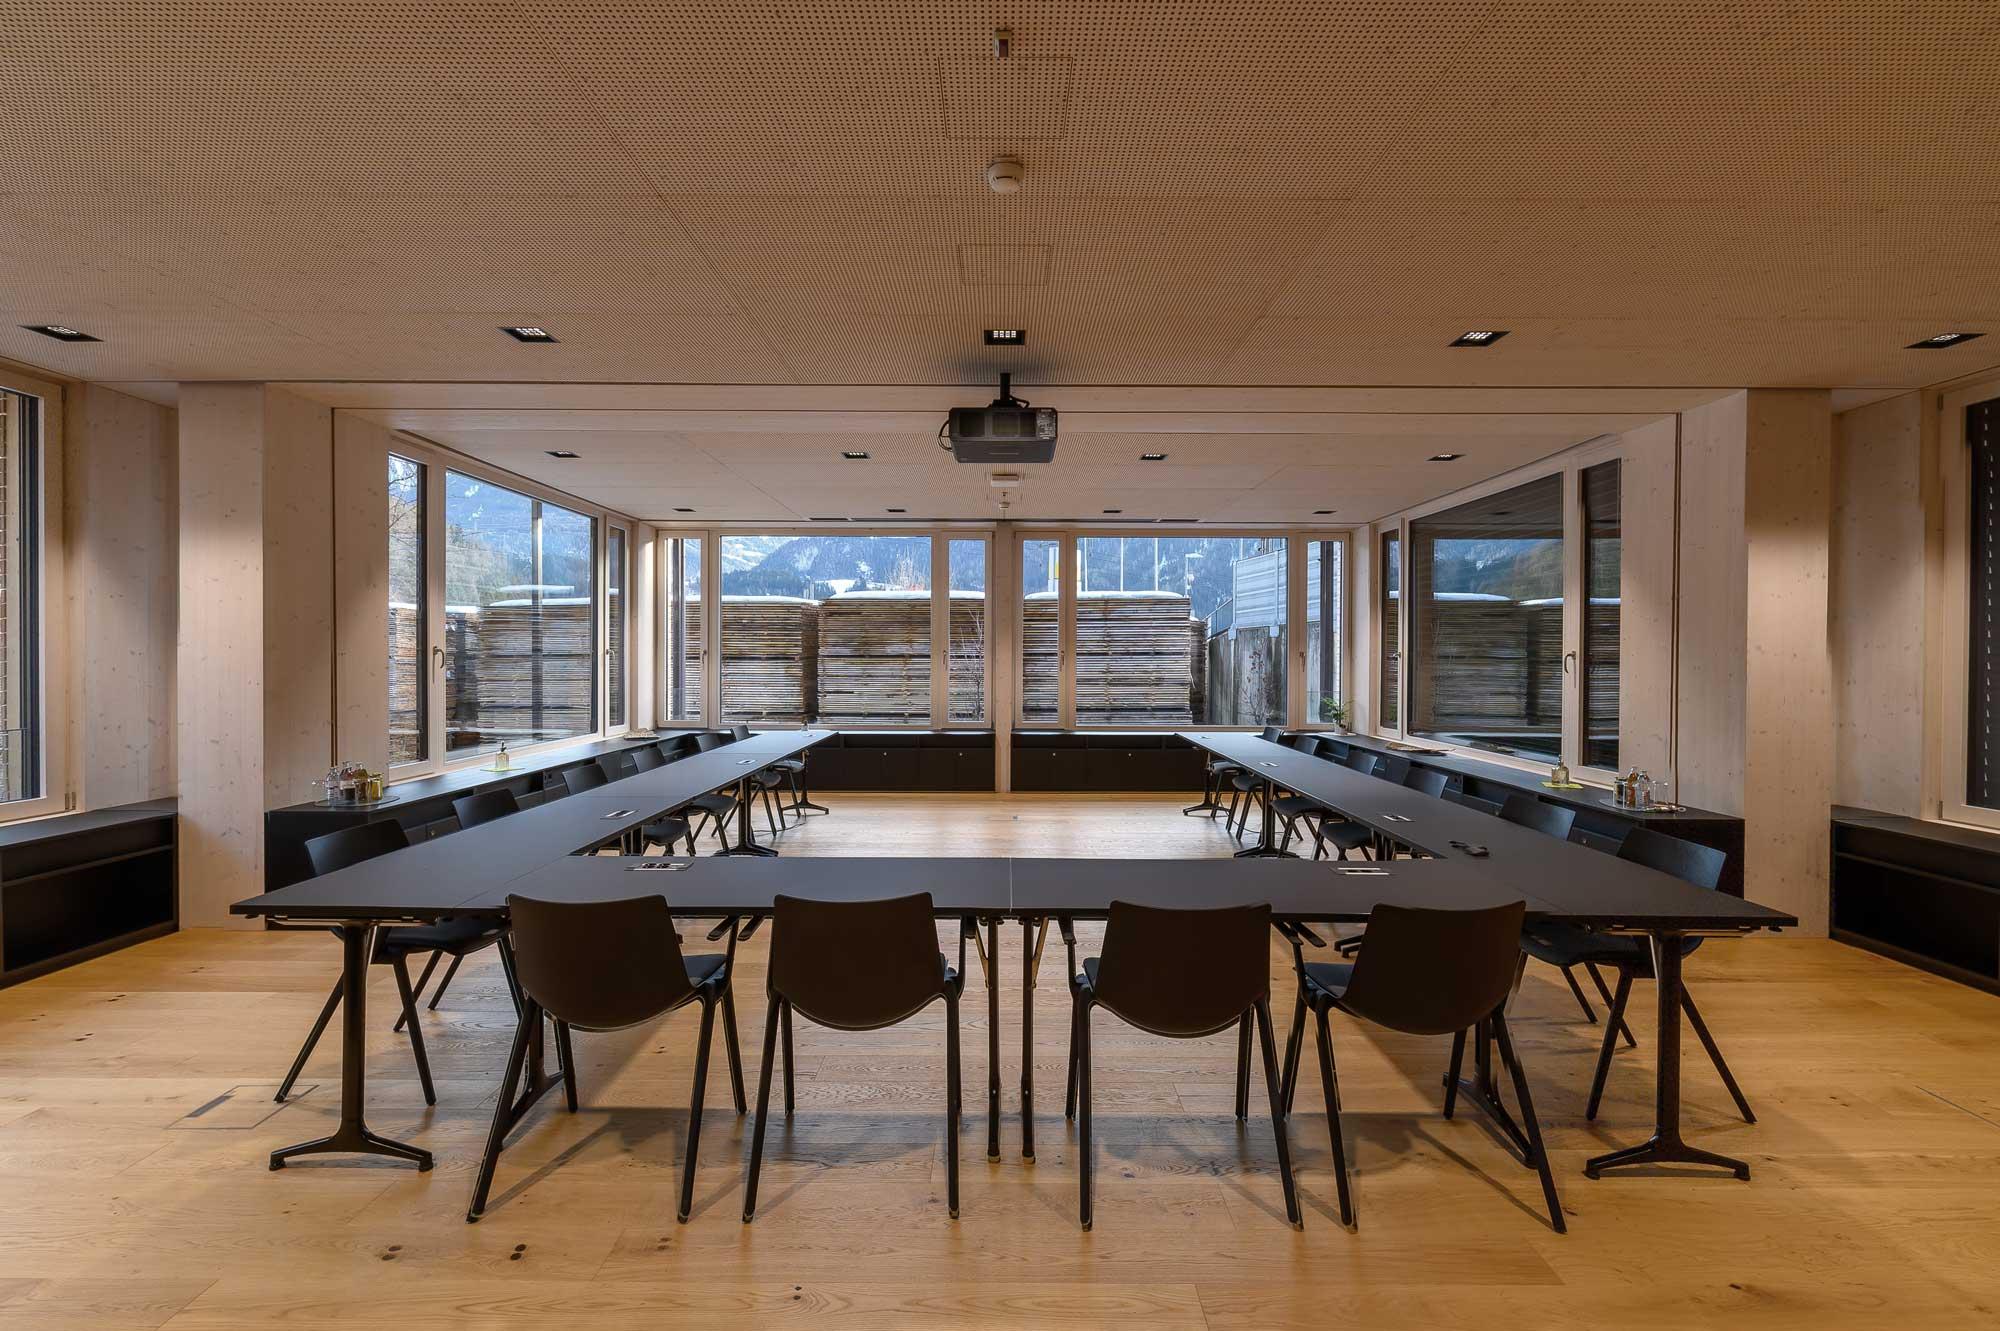 Holz Pfeifer I Referenz I großer Meetingraum I Projektor I Leinwand I Steuerung über iPad I AVsolutions